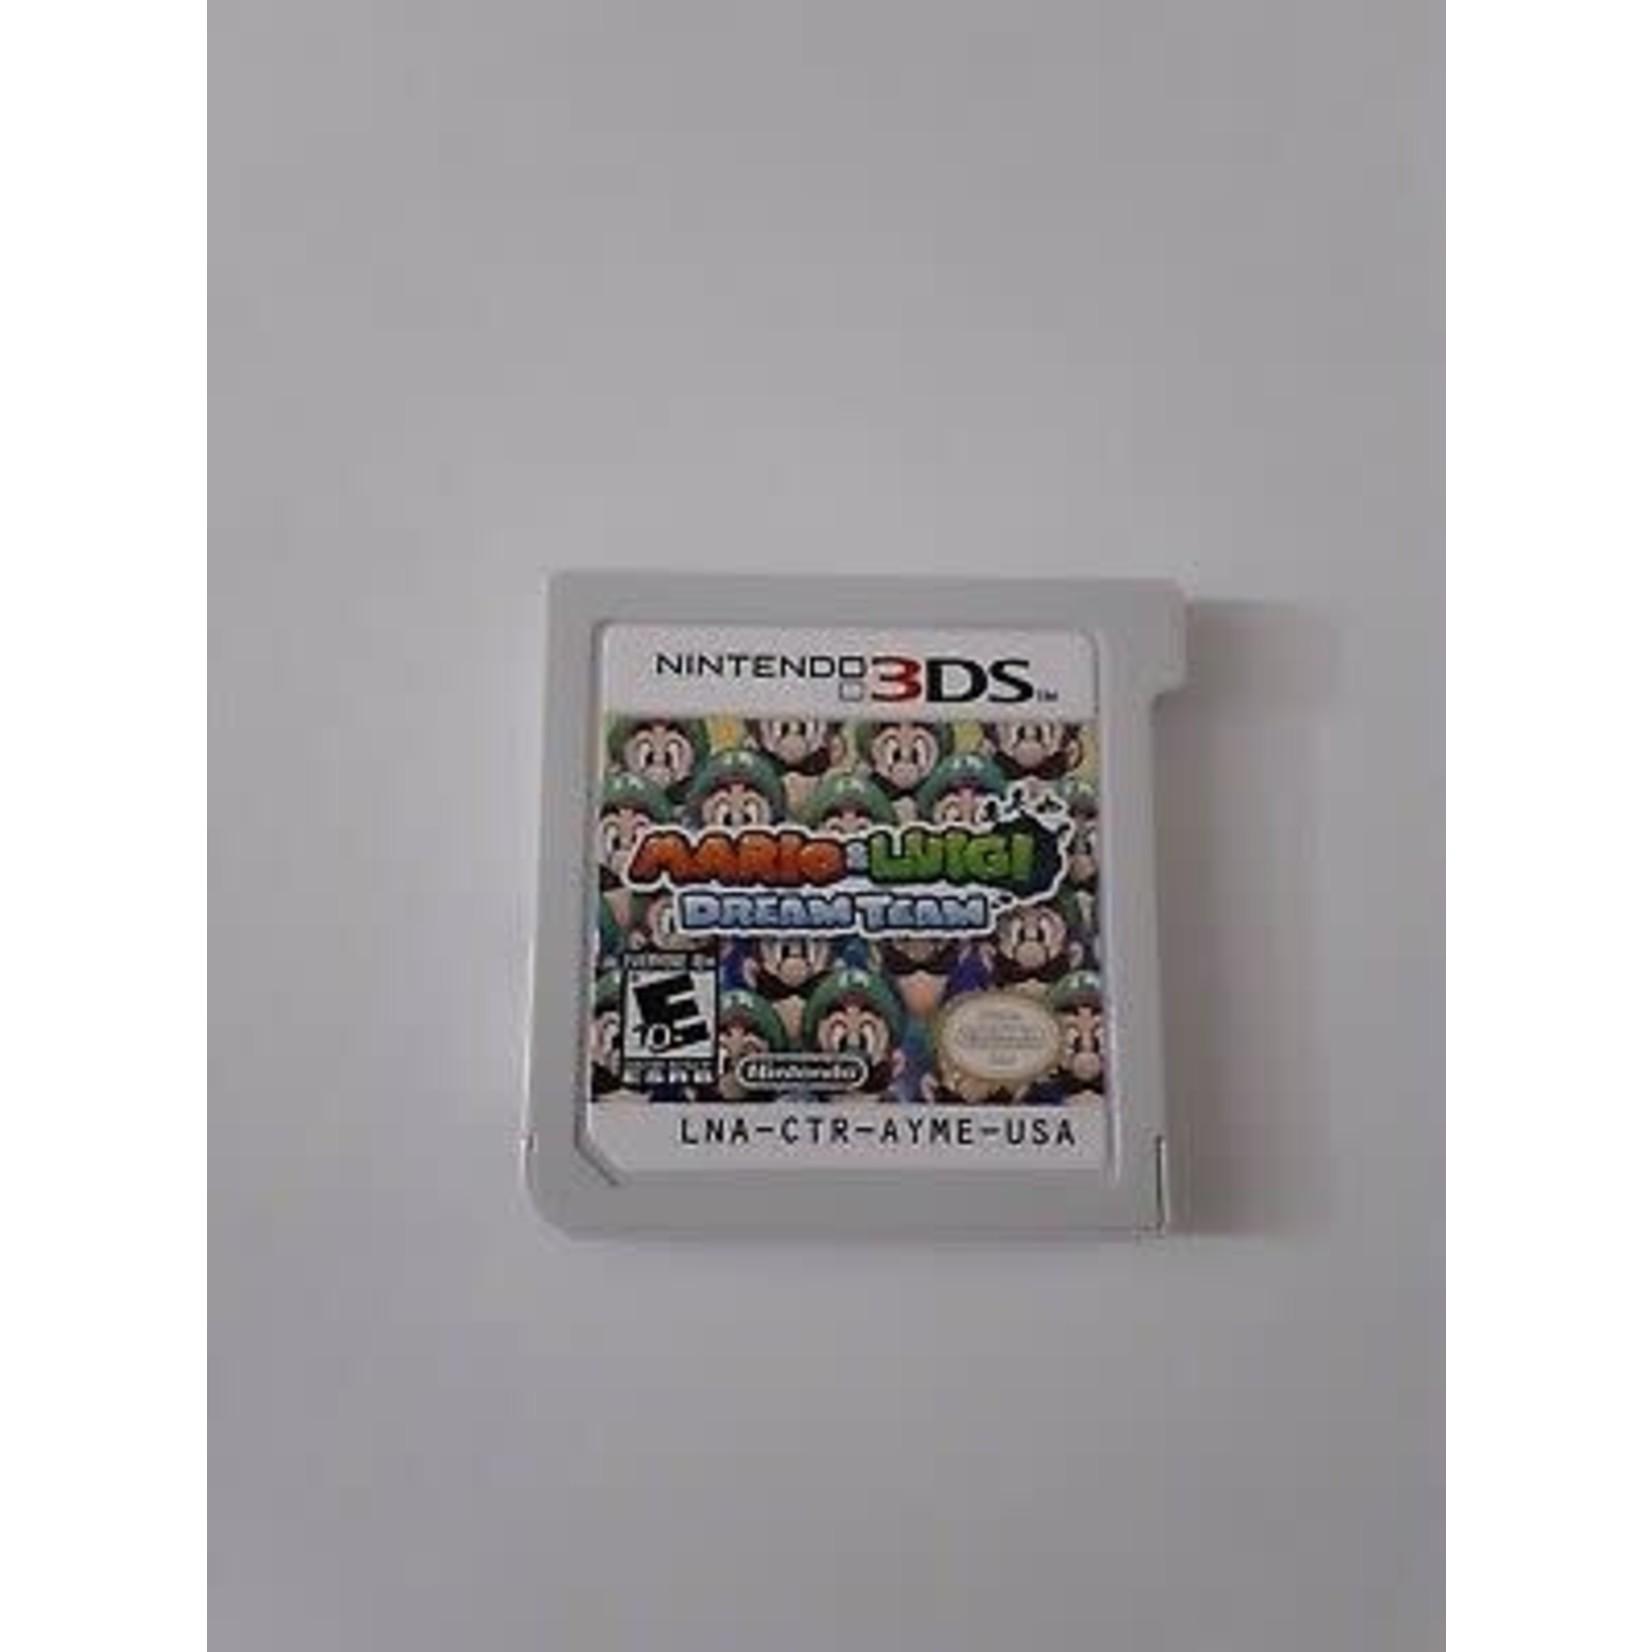 3DSU-Mario&Luigi Dream Team (Chip Only)